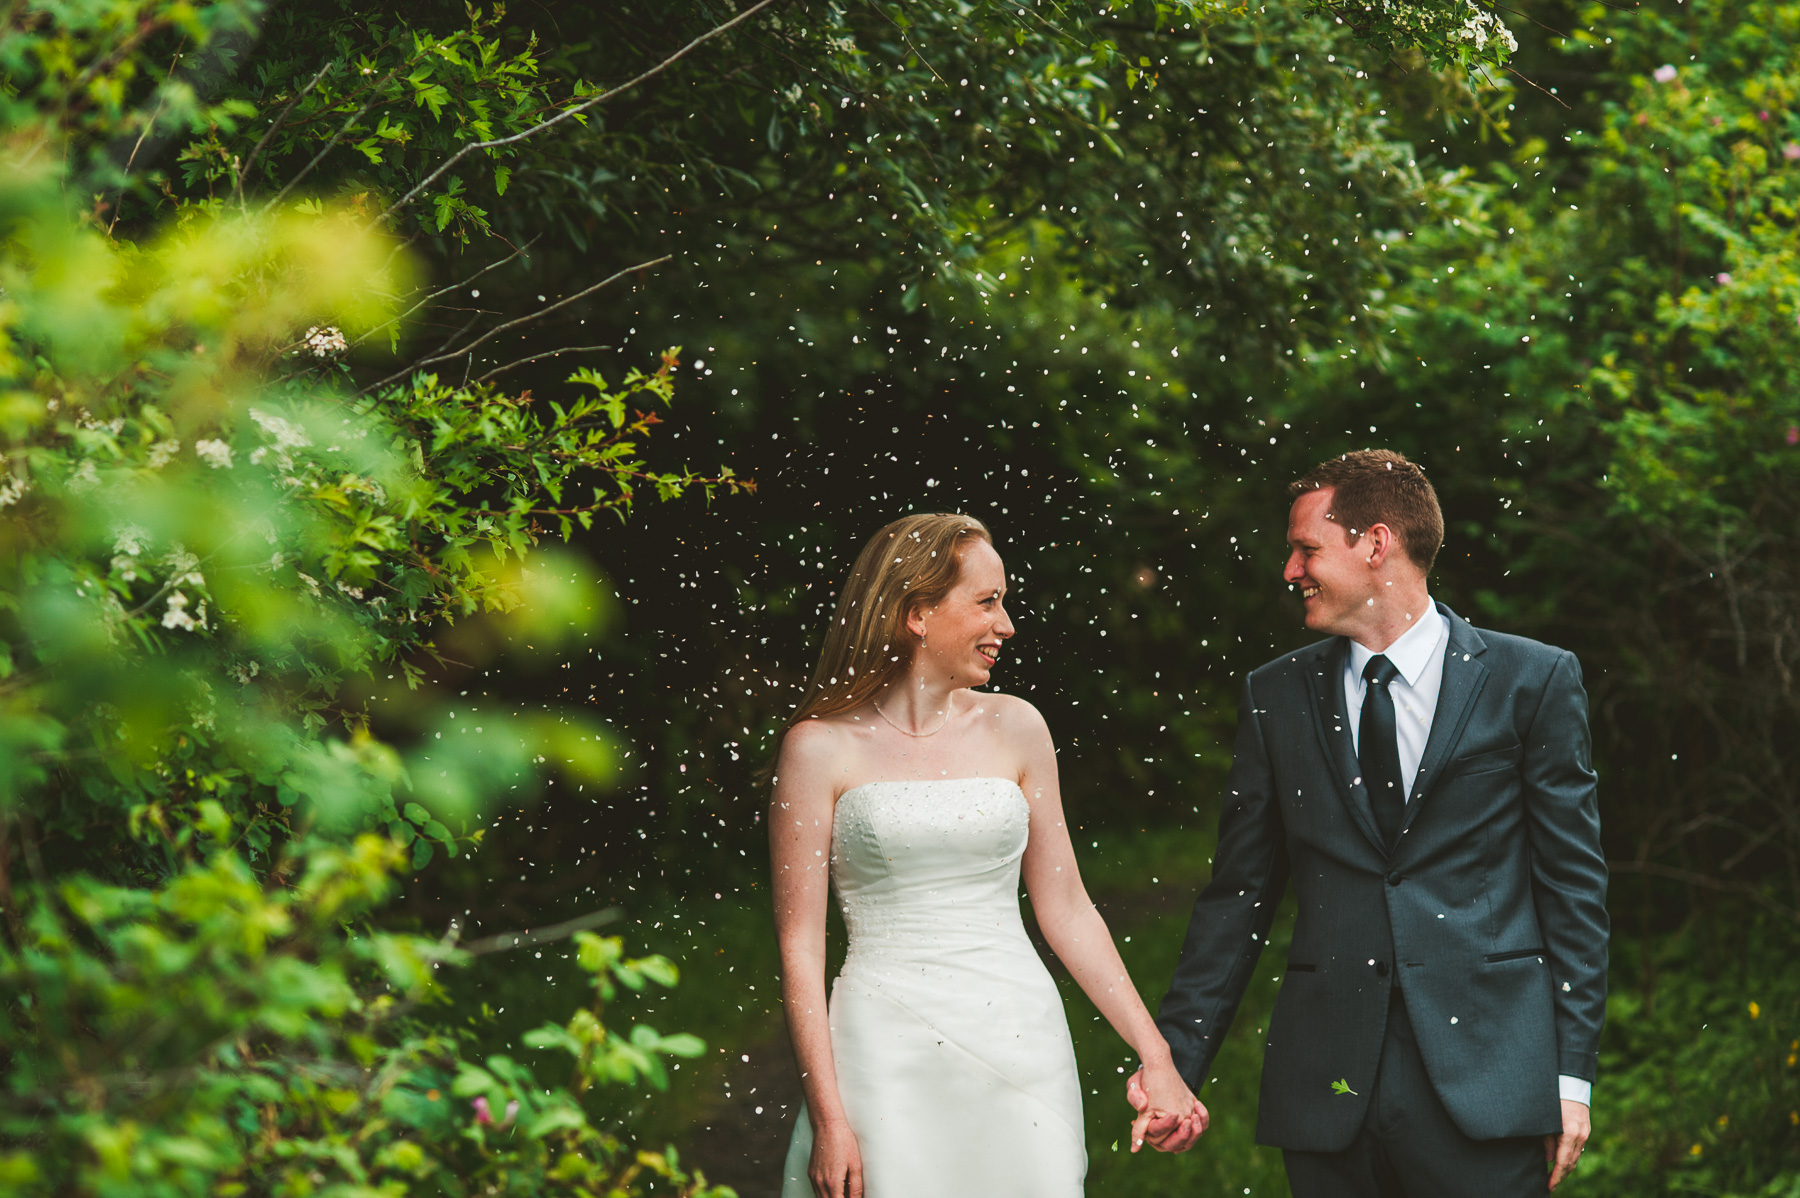 Victoria-BC-Wedding-Photography-122.jpg